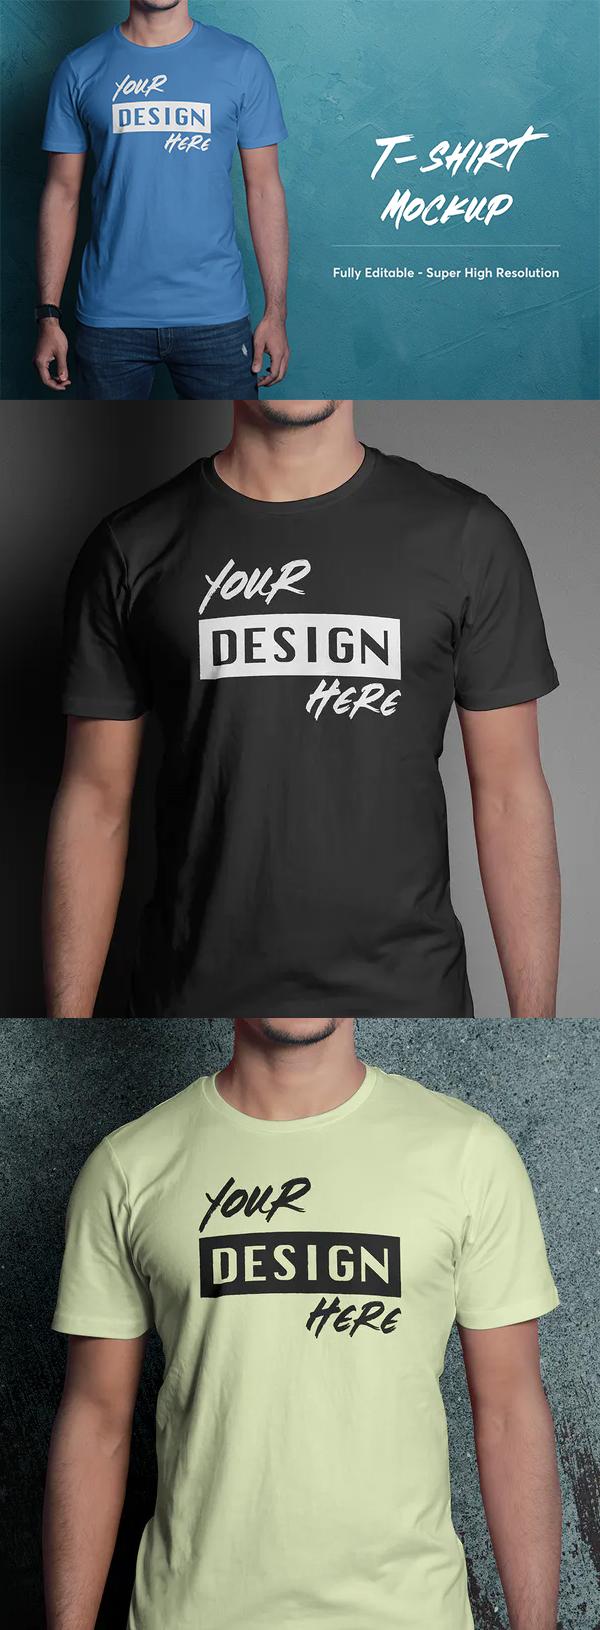 High-Quality T-Shirt Mockup